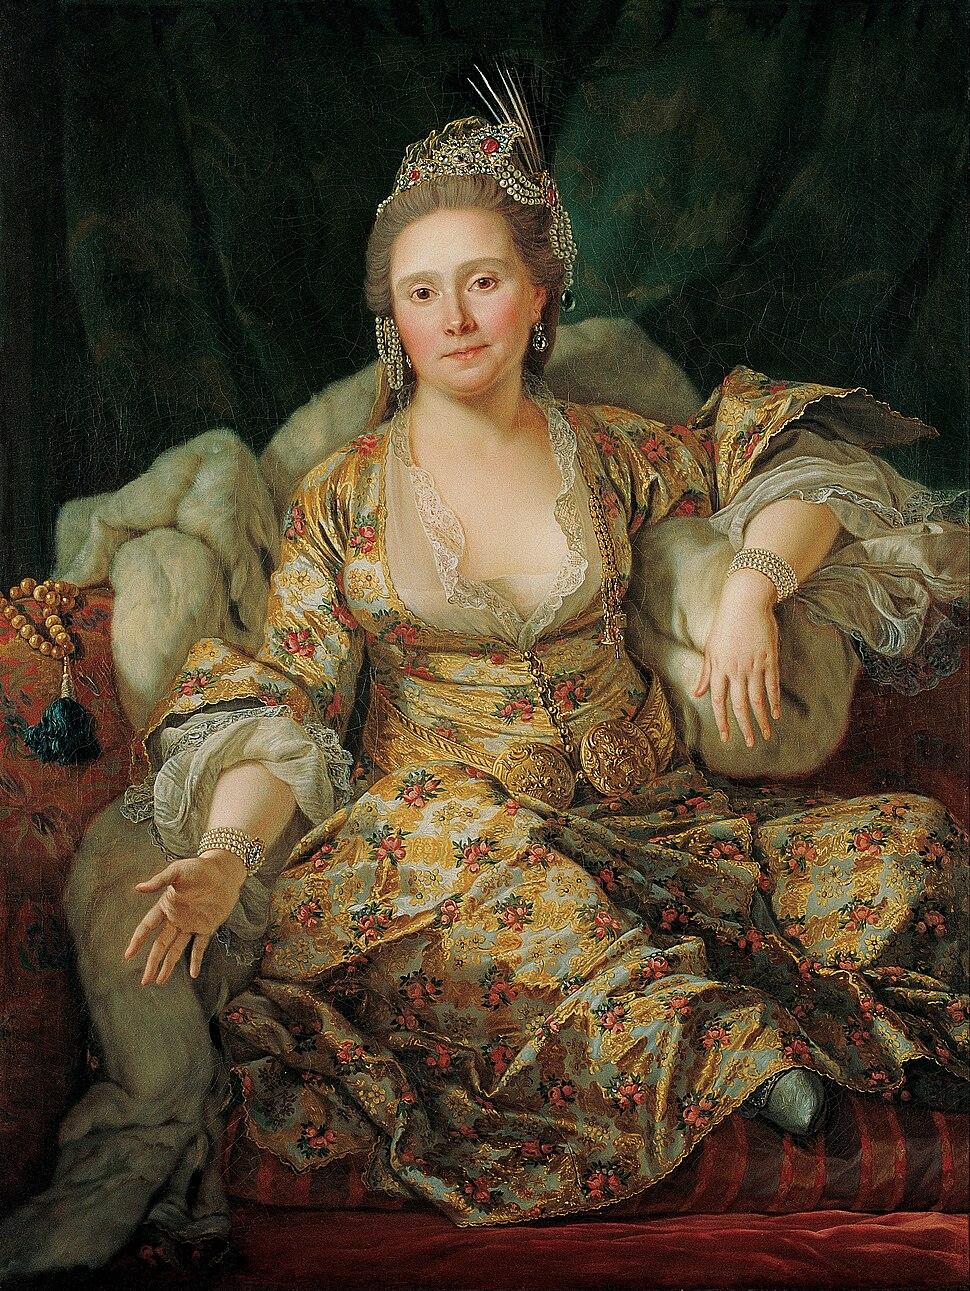 Antoine de Favray - Portrait of the Countess of Vergennes in Turkish Attire - Google Art Project